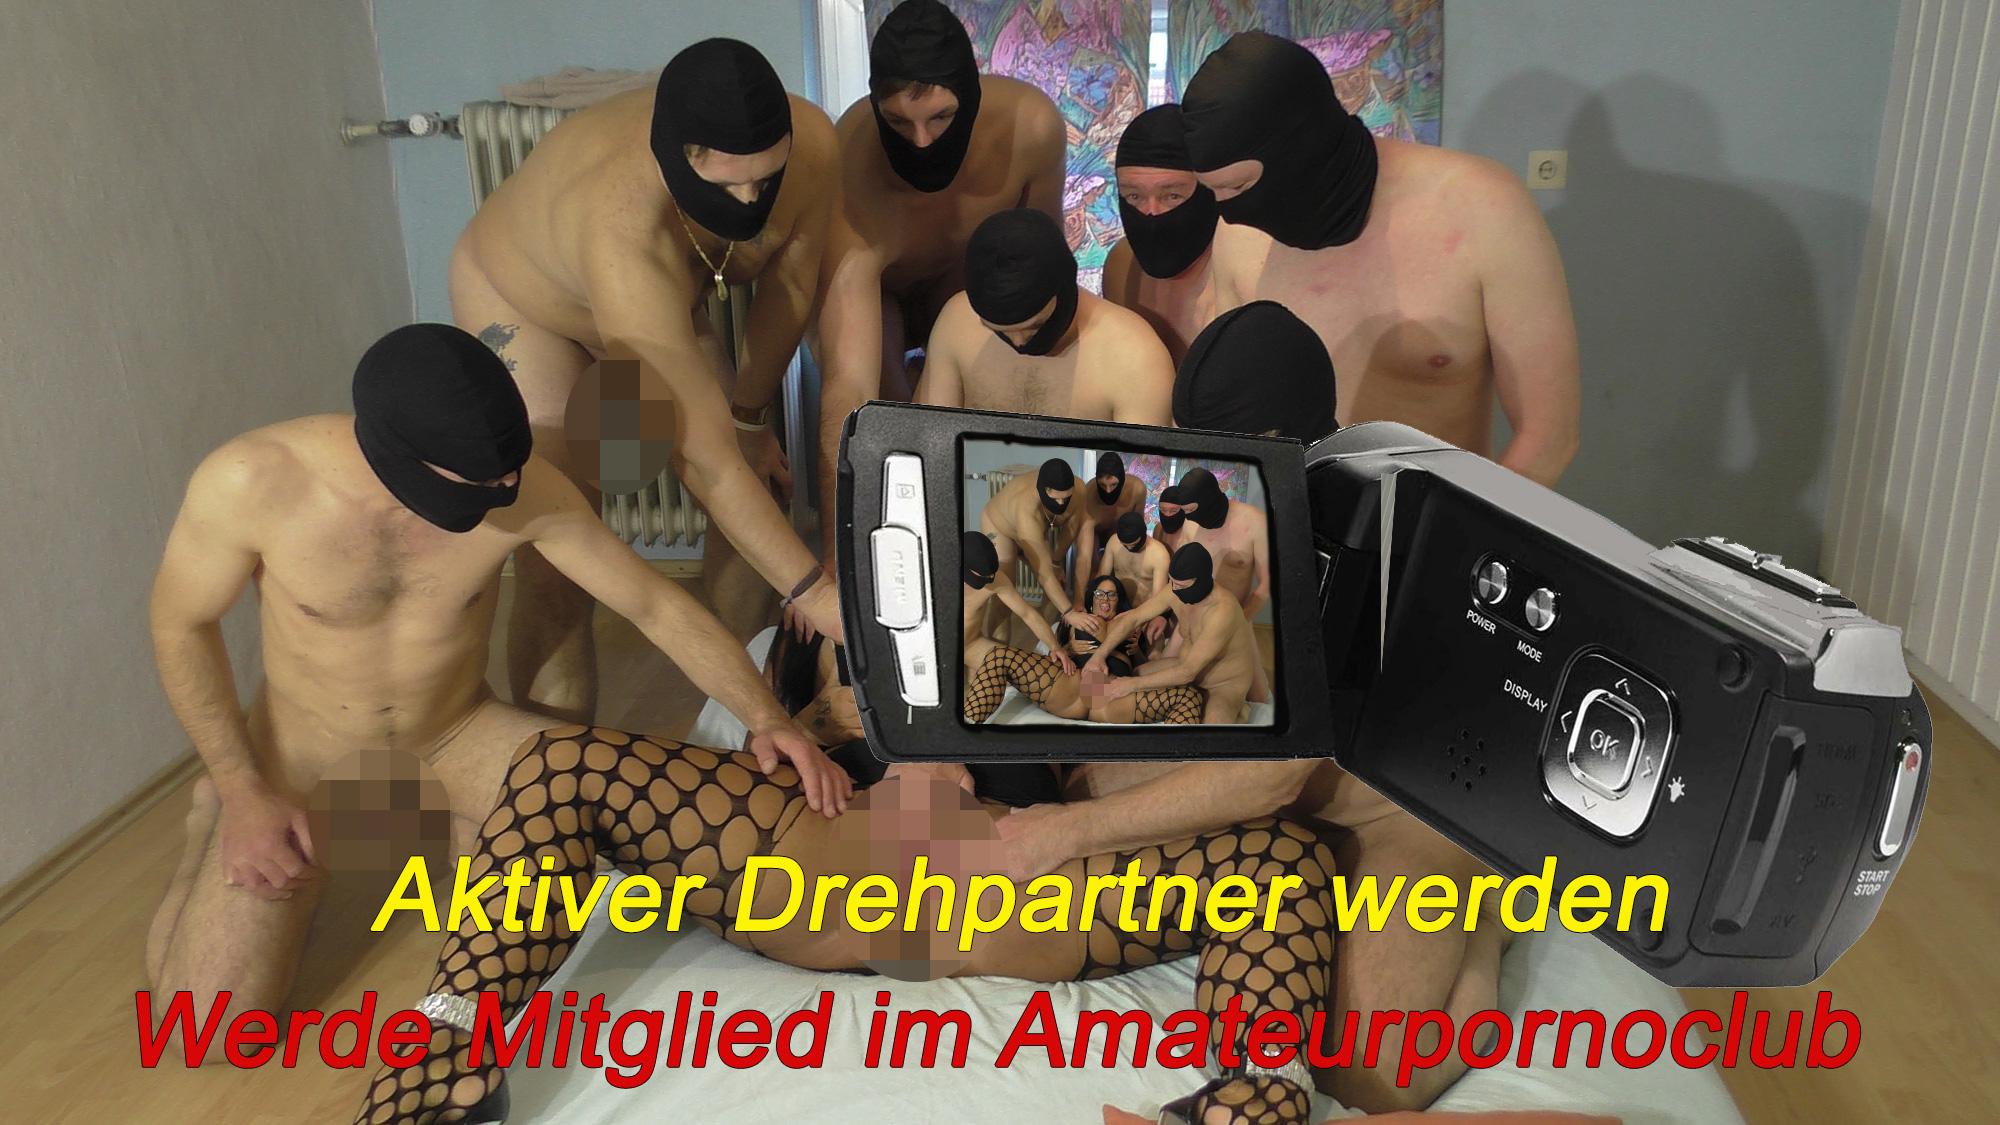 https://amateurporno-club.net/ac/bilder/optik/gruppenbild-Cam.jpg